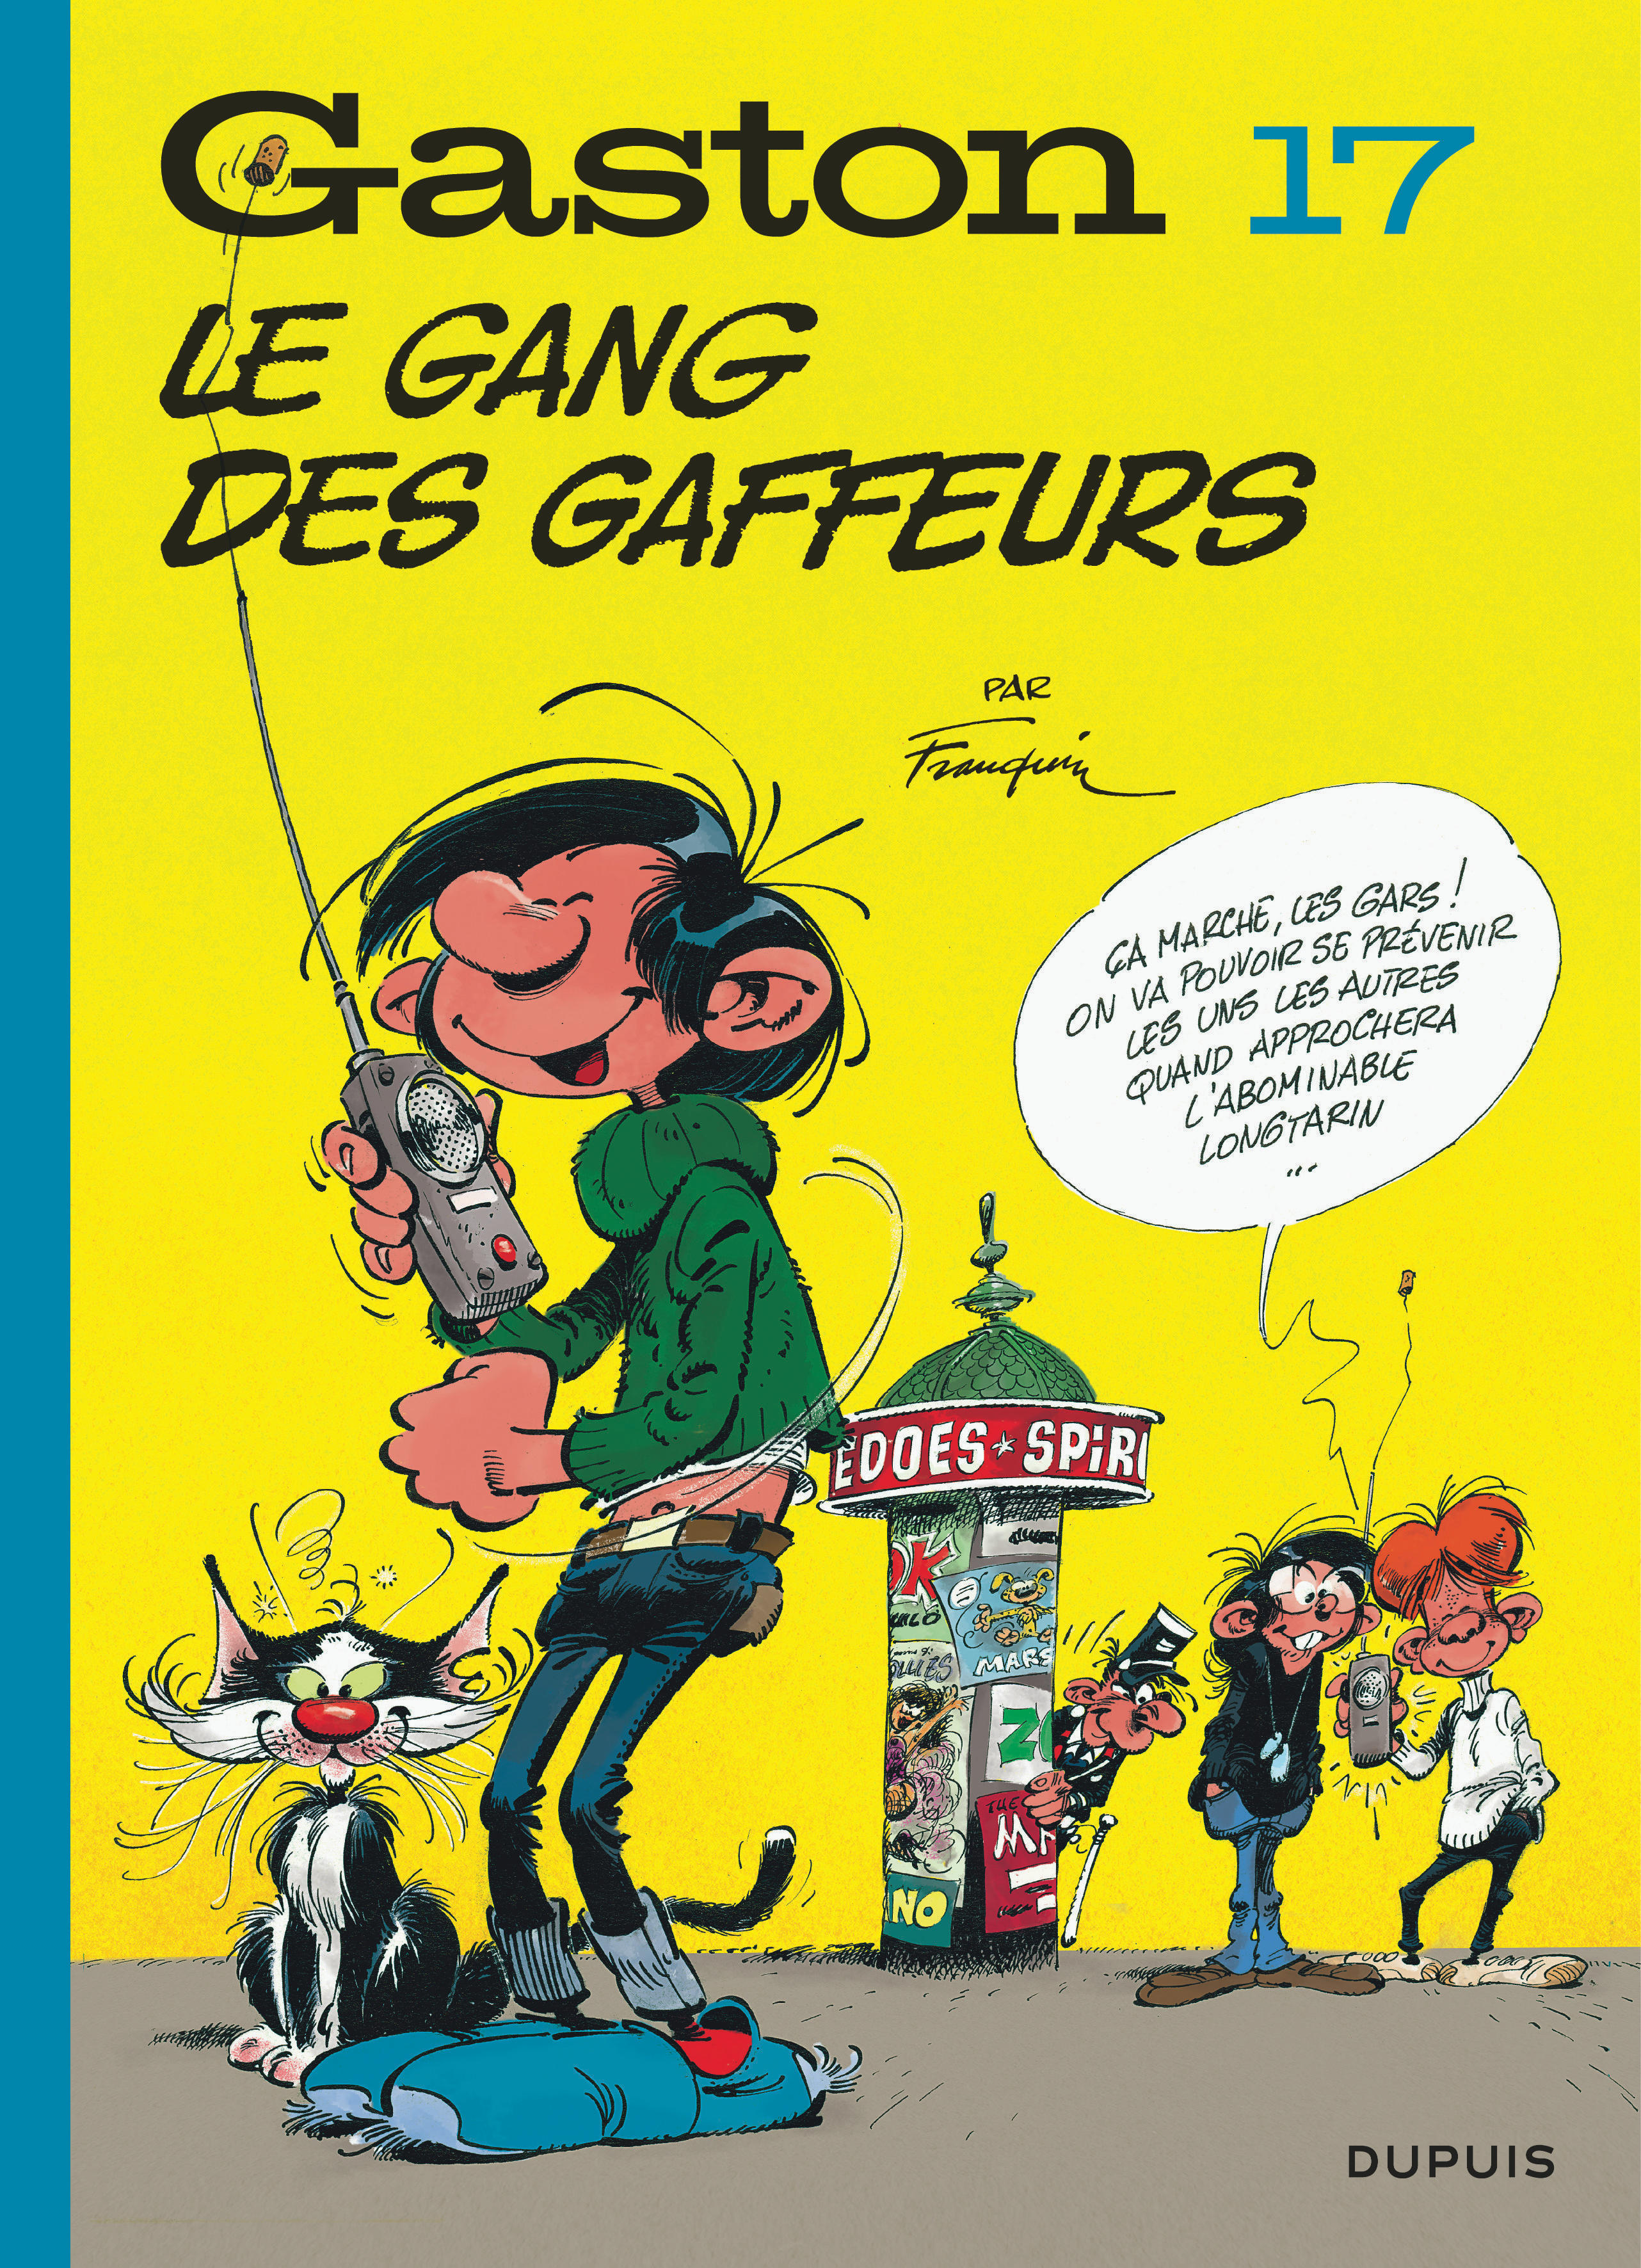 GASTON (EDITION 2018) T17 GASTON (EDITION 2018) - TOME 17 - LE GANG DES GAFFEURS (EDITION 2018)